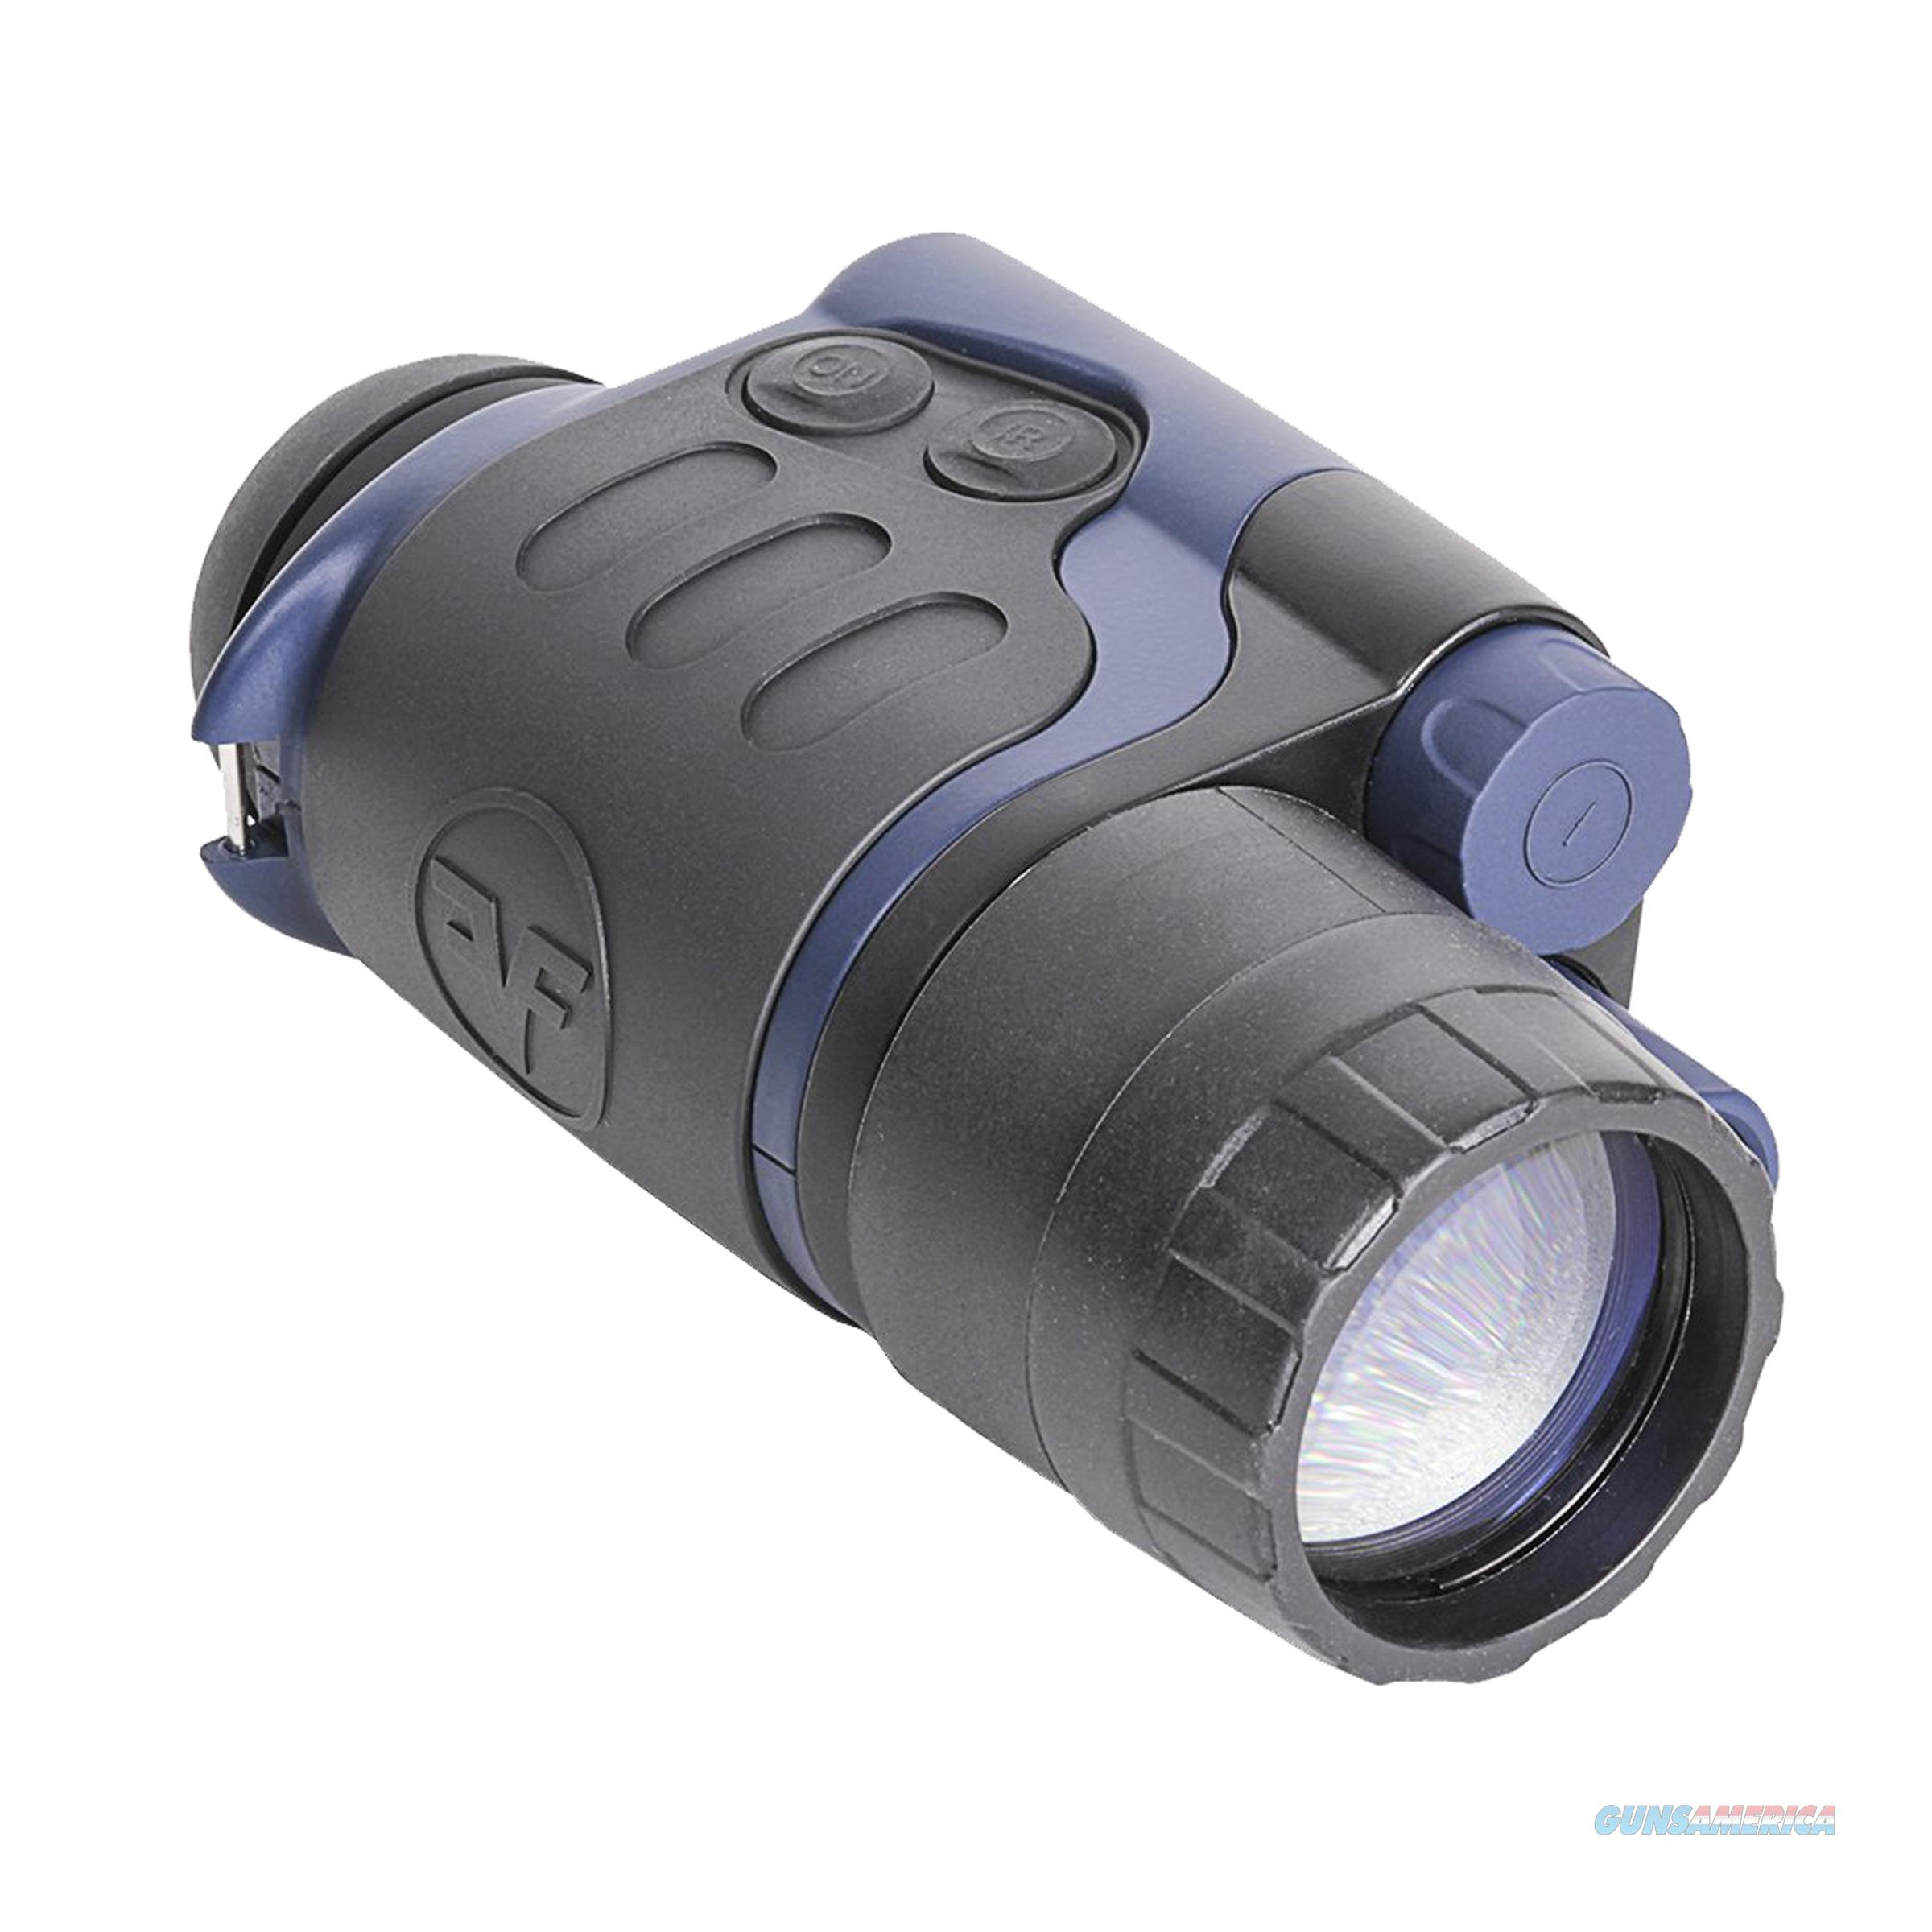 Firefield Spartan Night Vision Monocular FF24122WP  Non-Guns > Night Vision